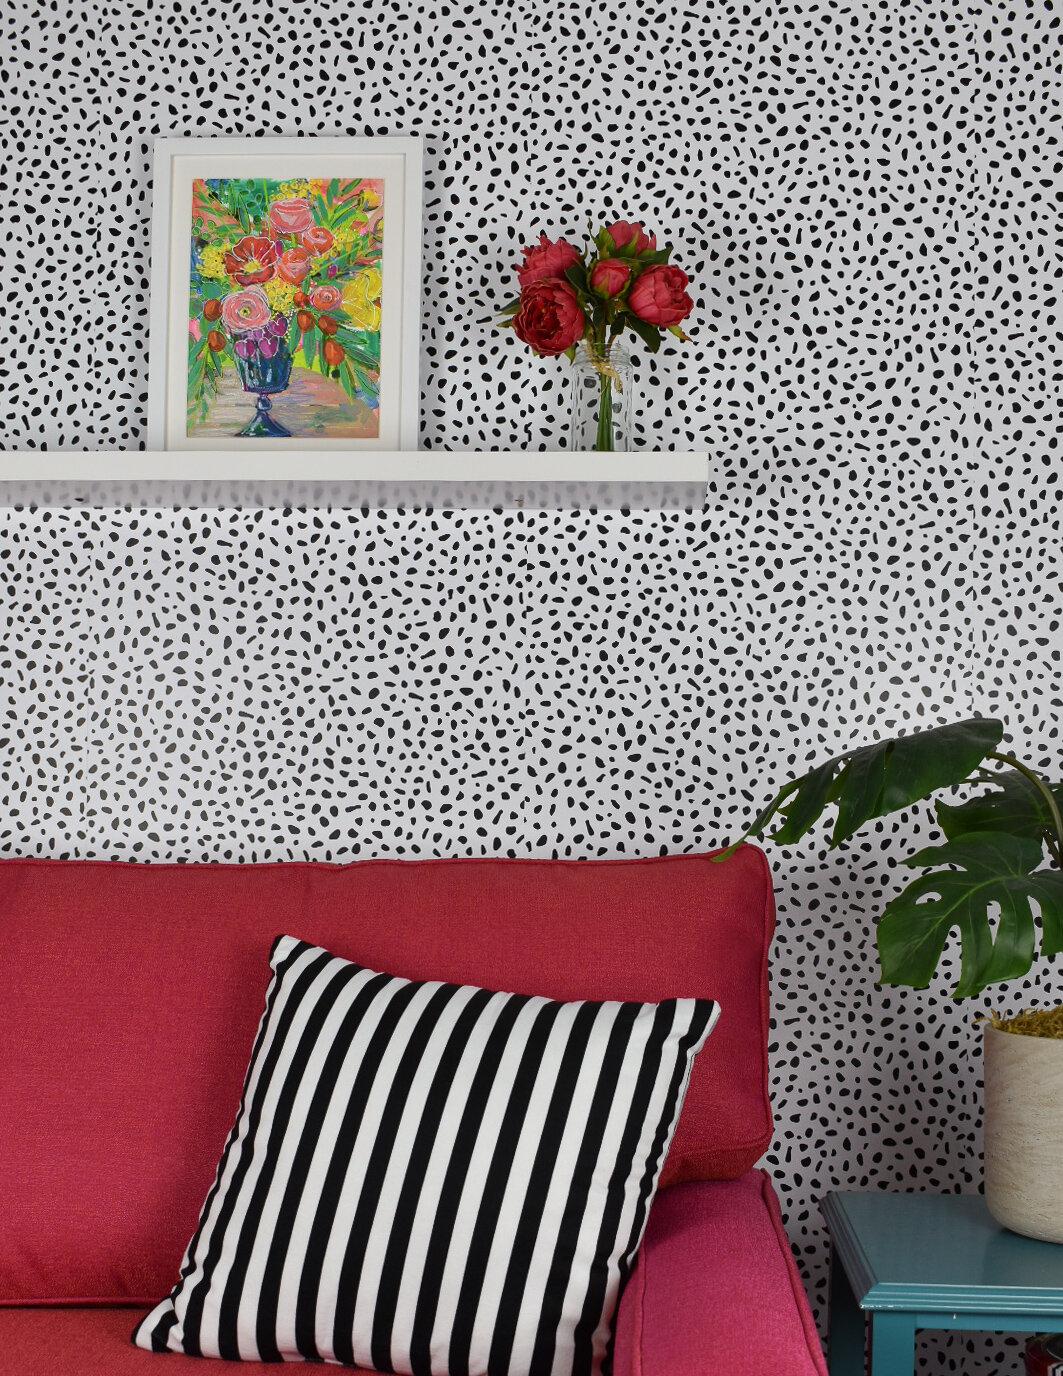 boho_flowers_painting_eclectic_tropical_daisyfaithart_3.jpg